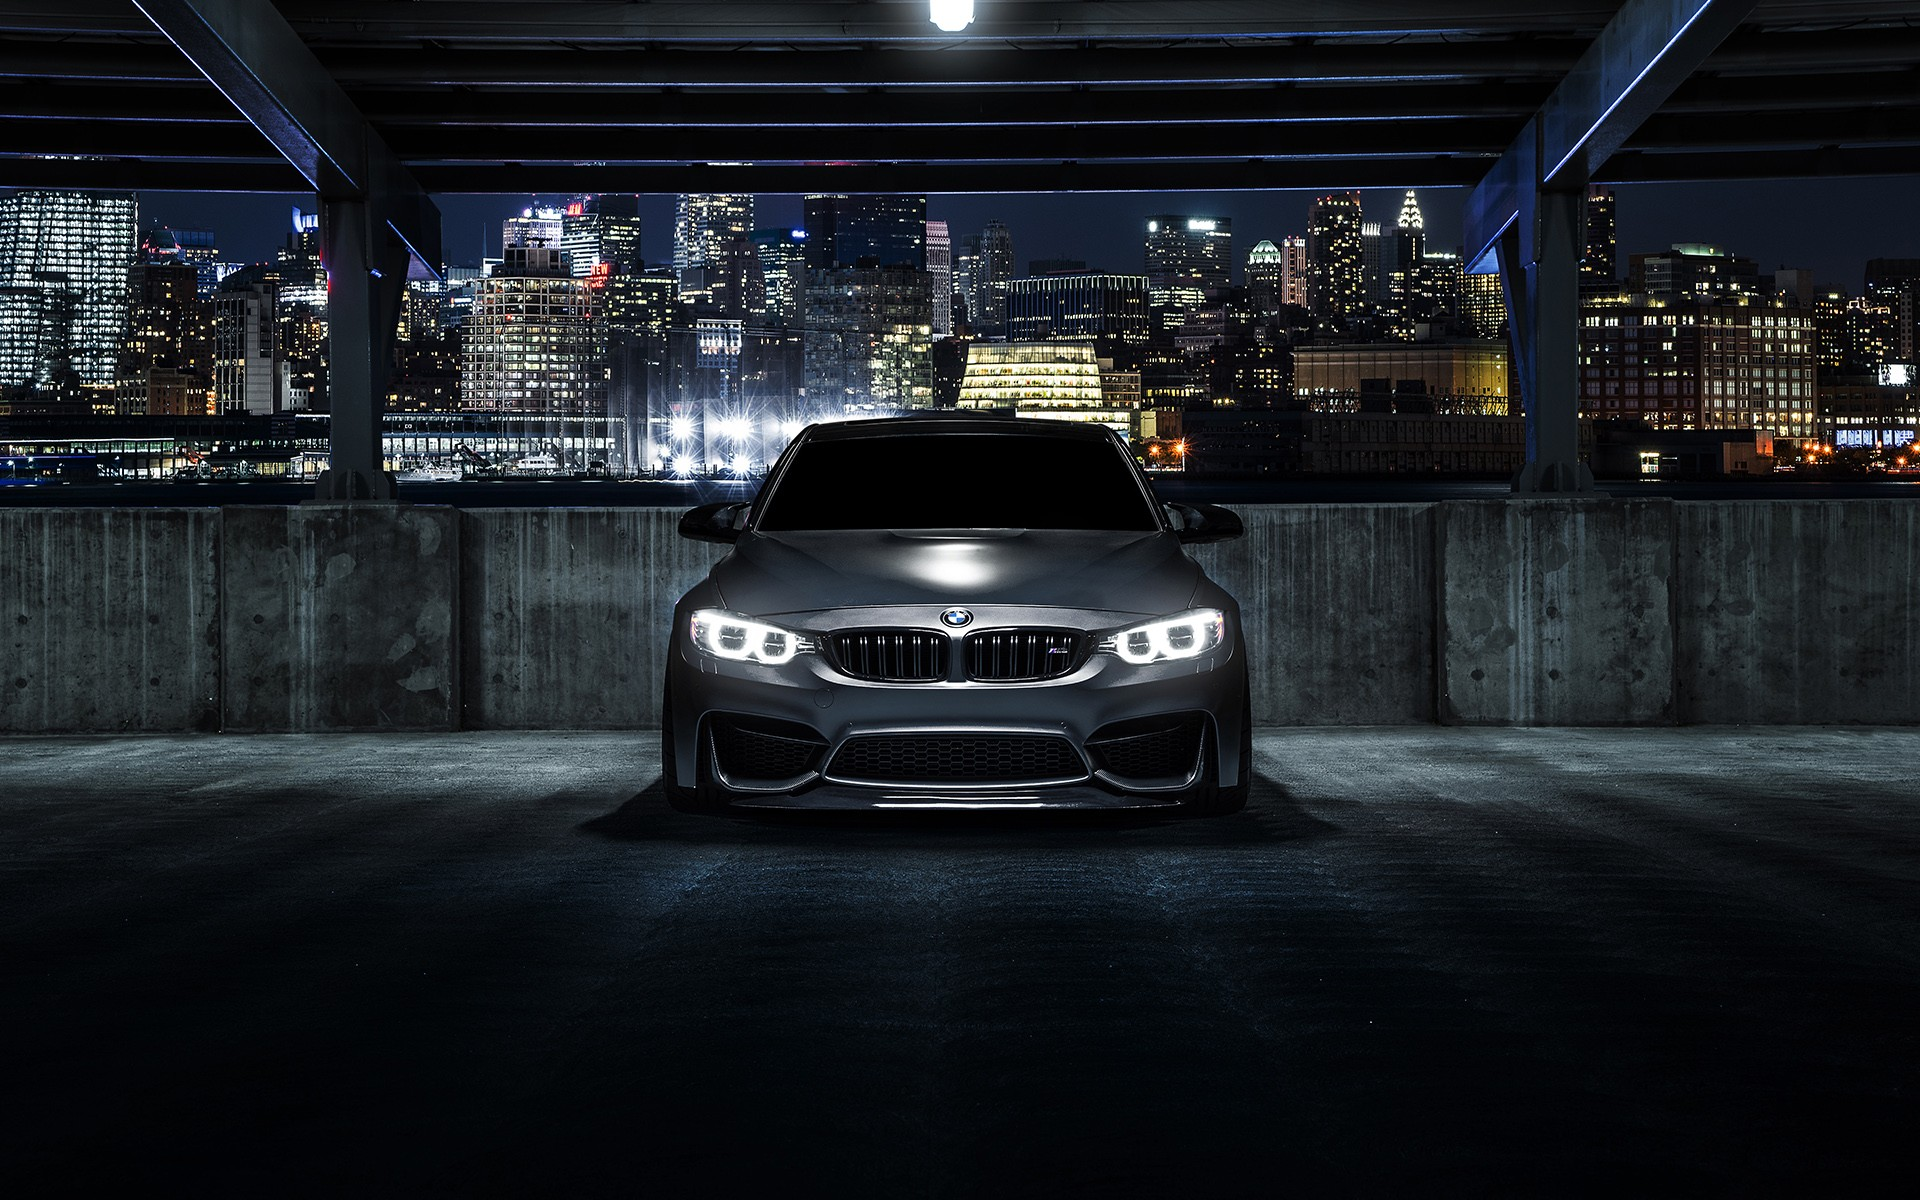 Bmw M3 Mode Carbon Sonic Motorsport Wallpaper Hd Car